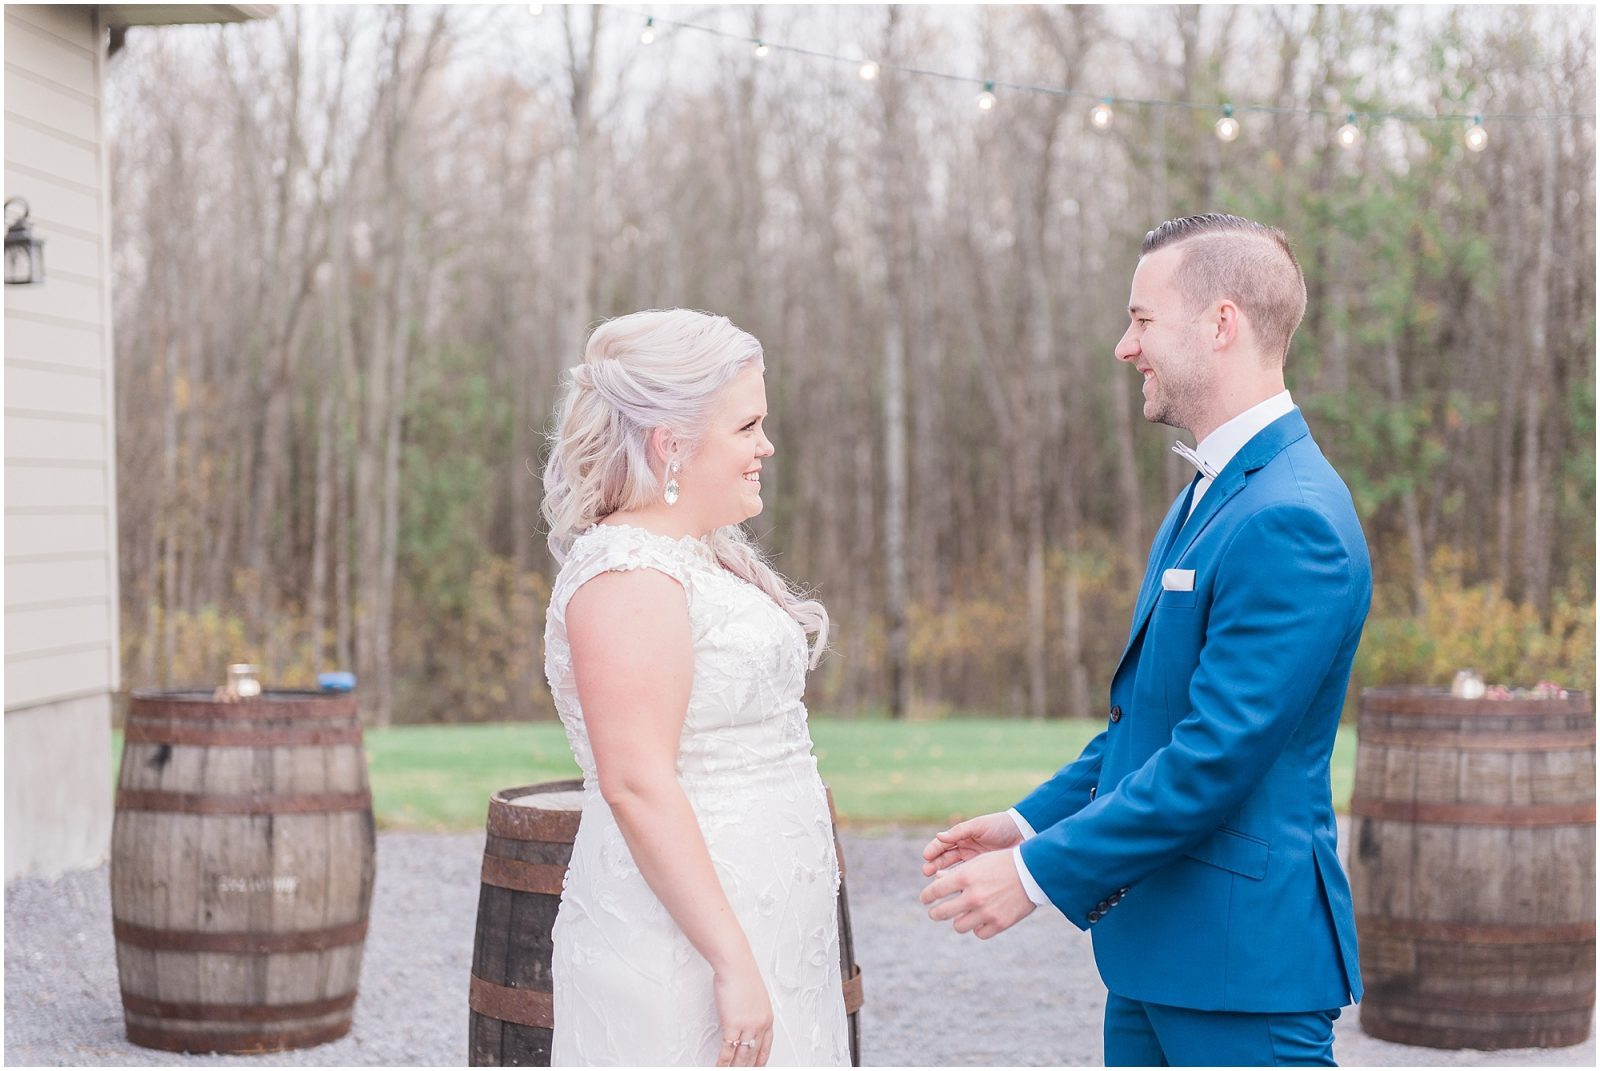 0037 Bethany and Luc - Fall Backyard Ottawa Wedding - Copper and Navy - PhotosbyEmmaH.jpg